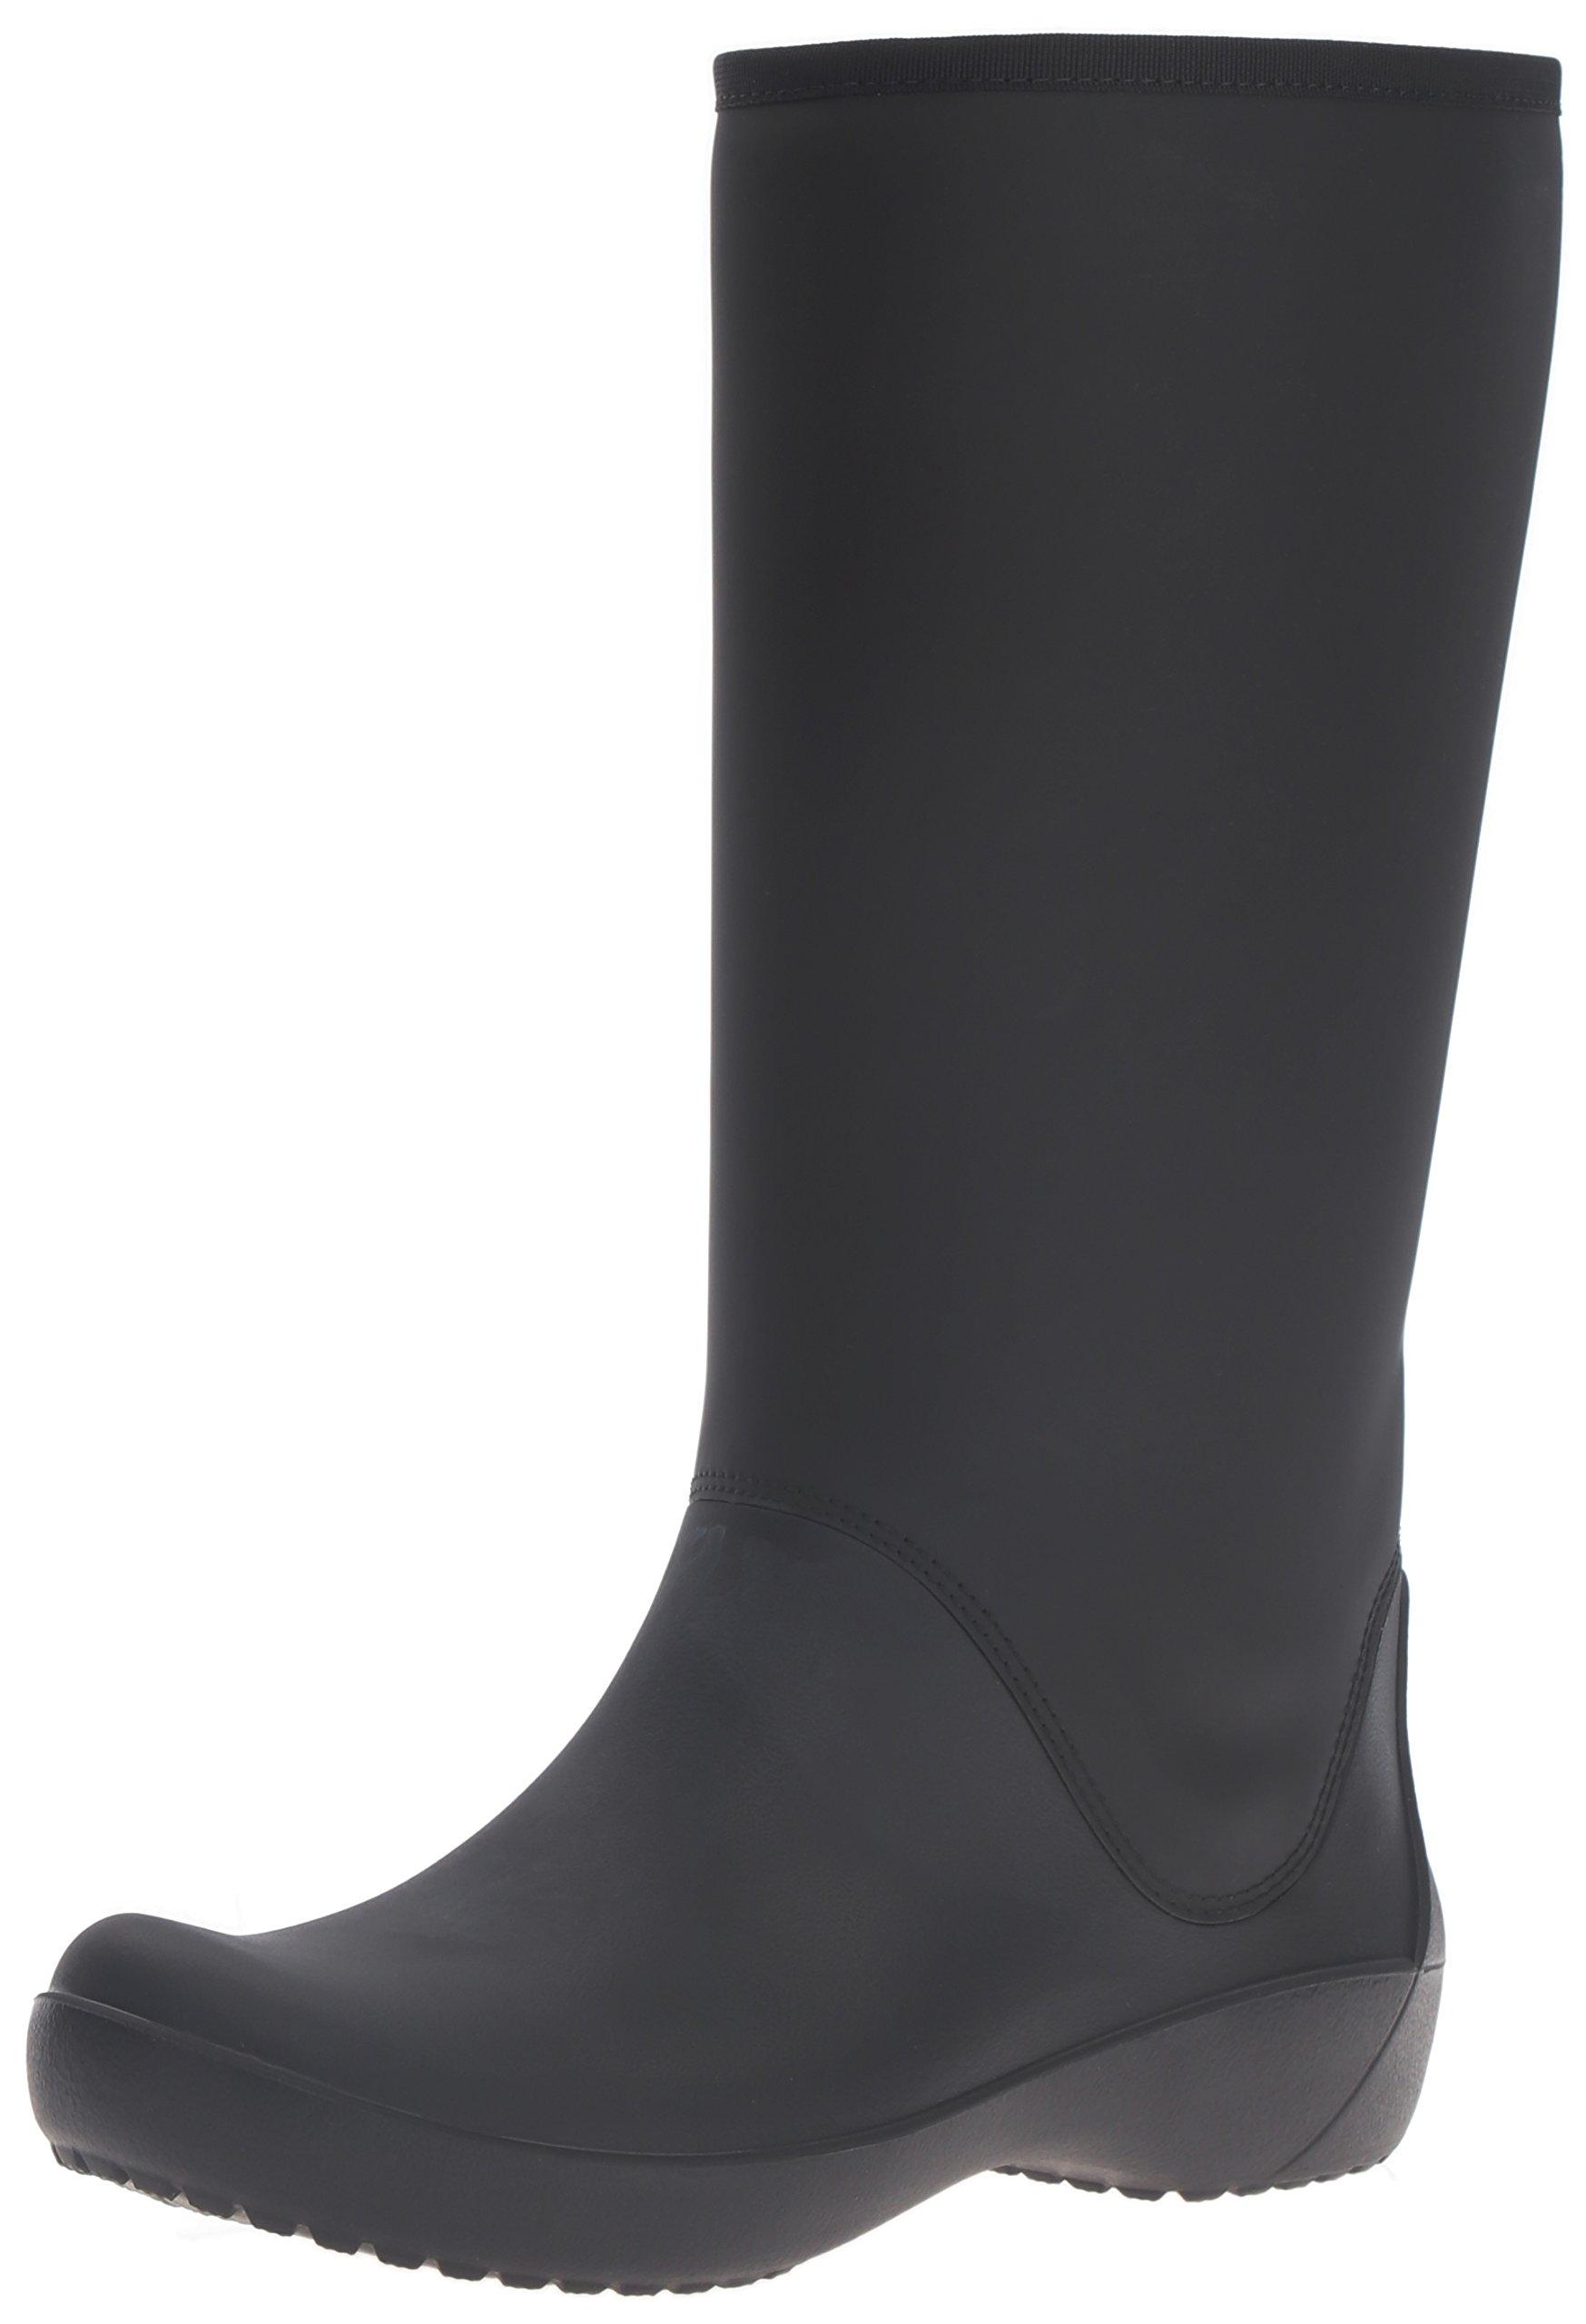 crocs Women's Rain floe Tall Boot, Black, 8 M US